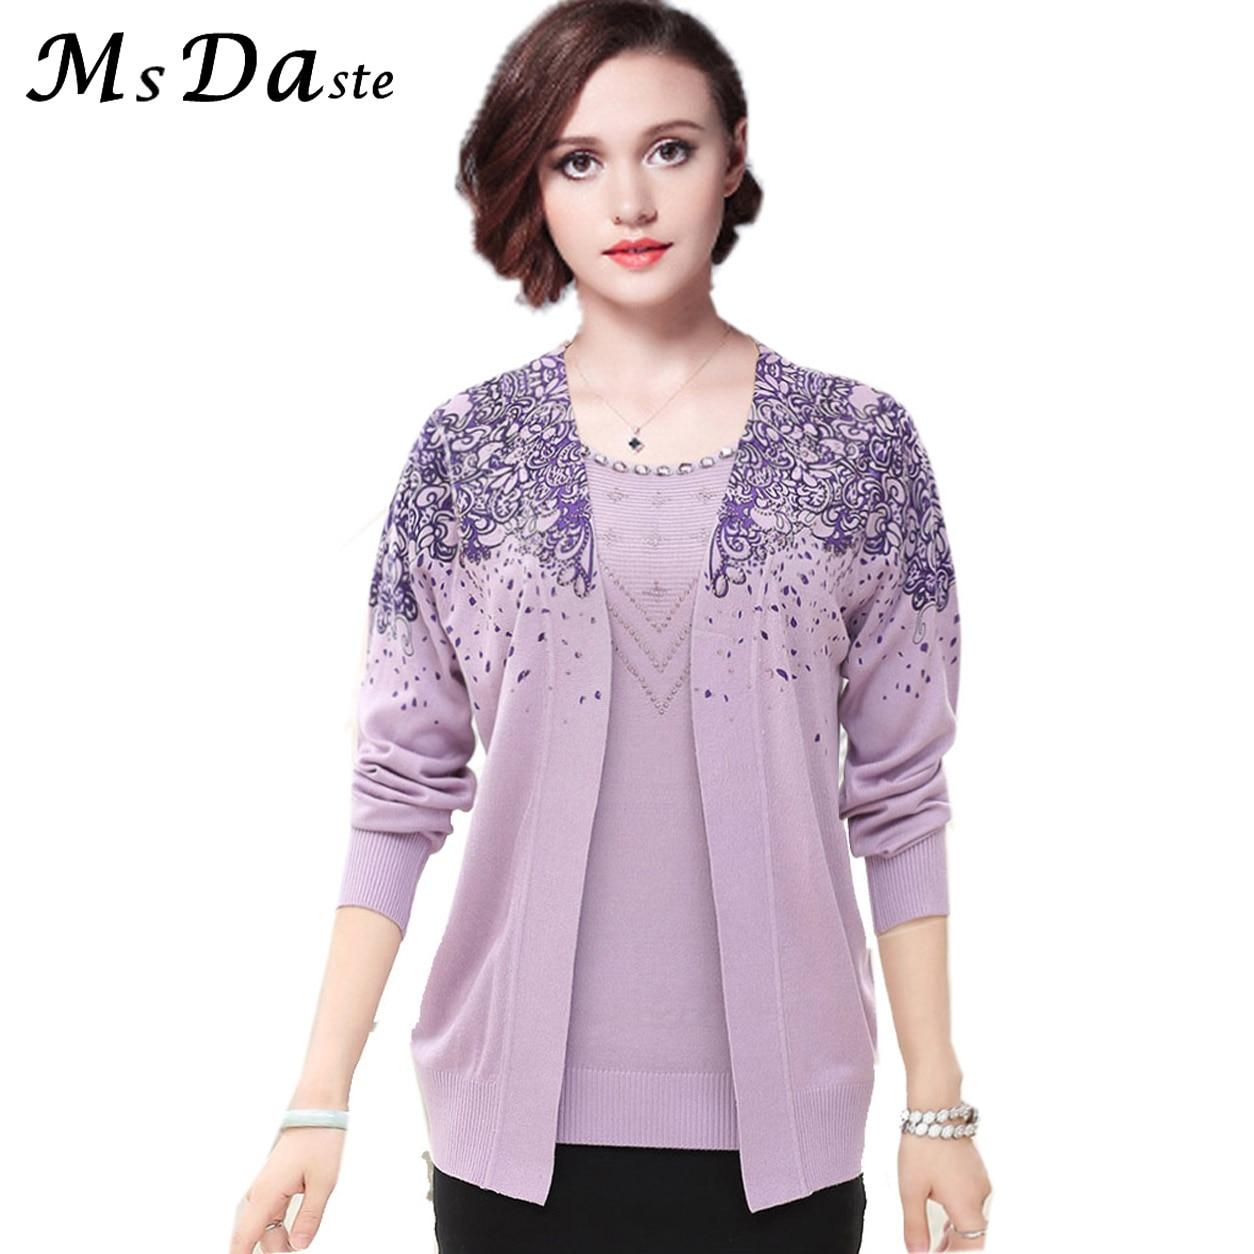 2018 Autumn Set 2 Pieces Women Sweaters Tops Floral Tee Shirt + Blouse Suits Winter Pullovers Pull Femme Plus Size M~3XL 9 Color